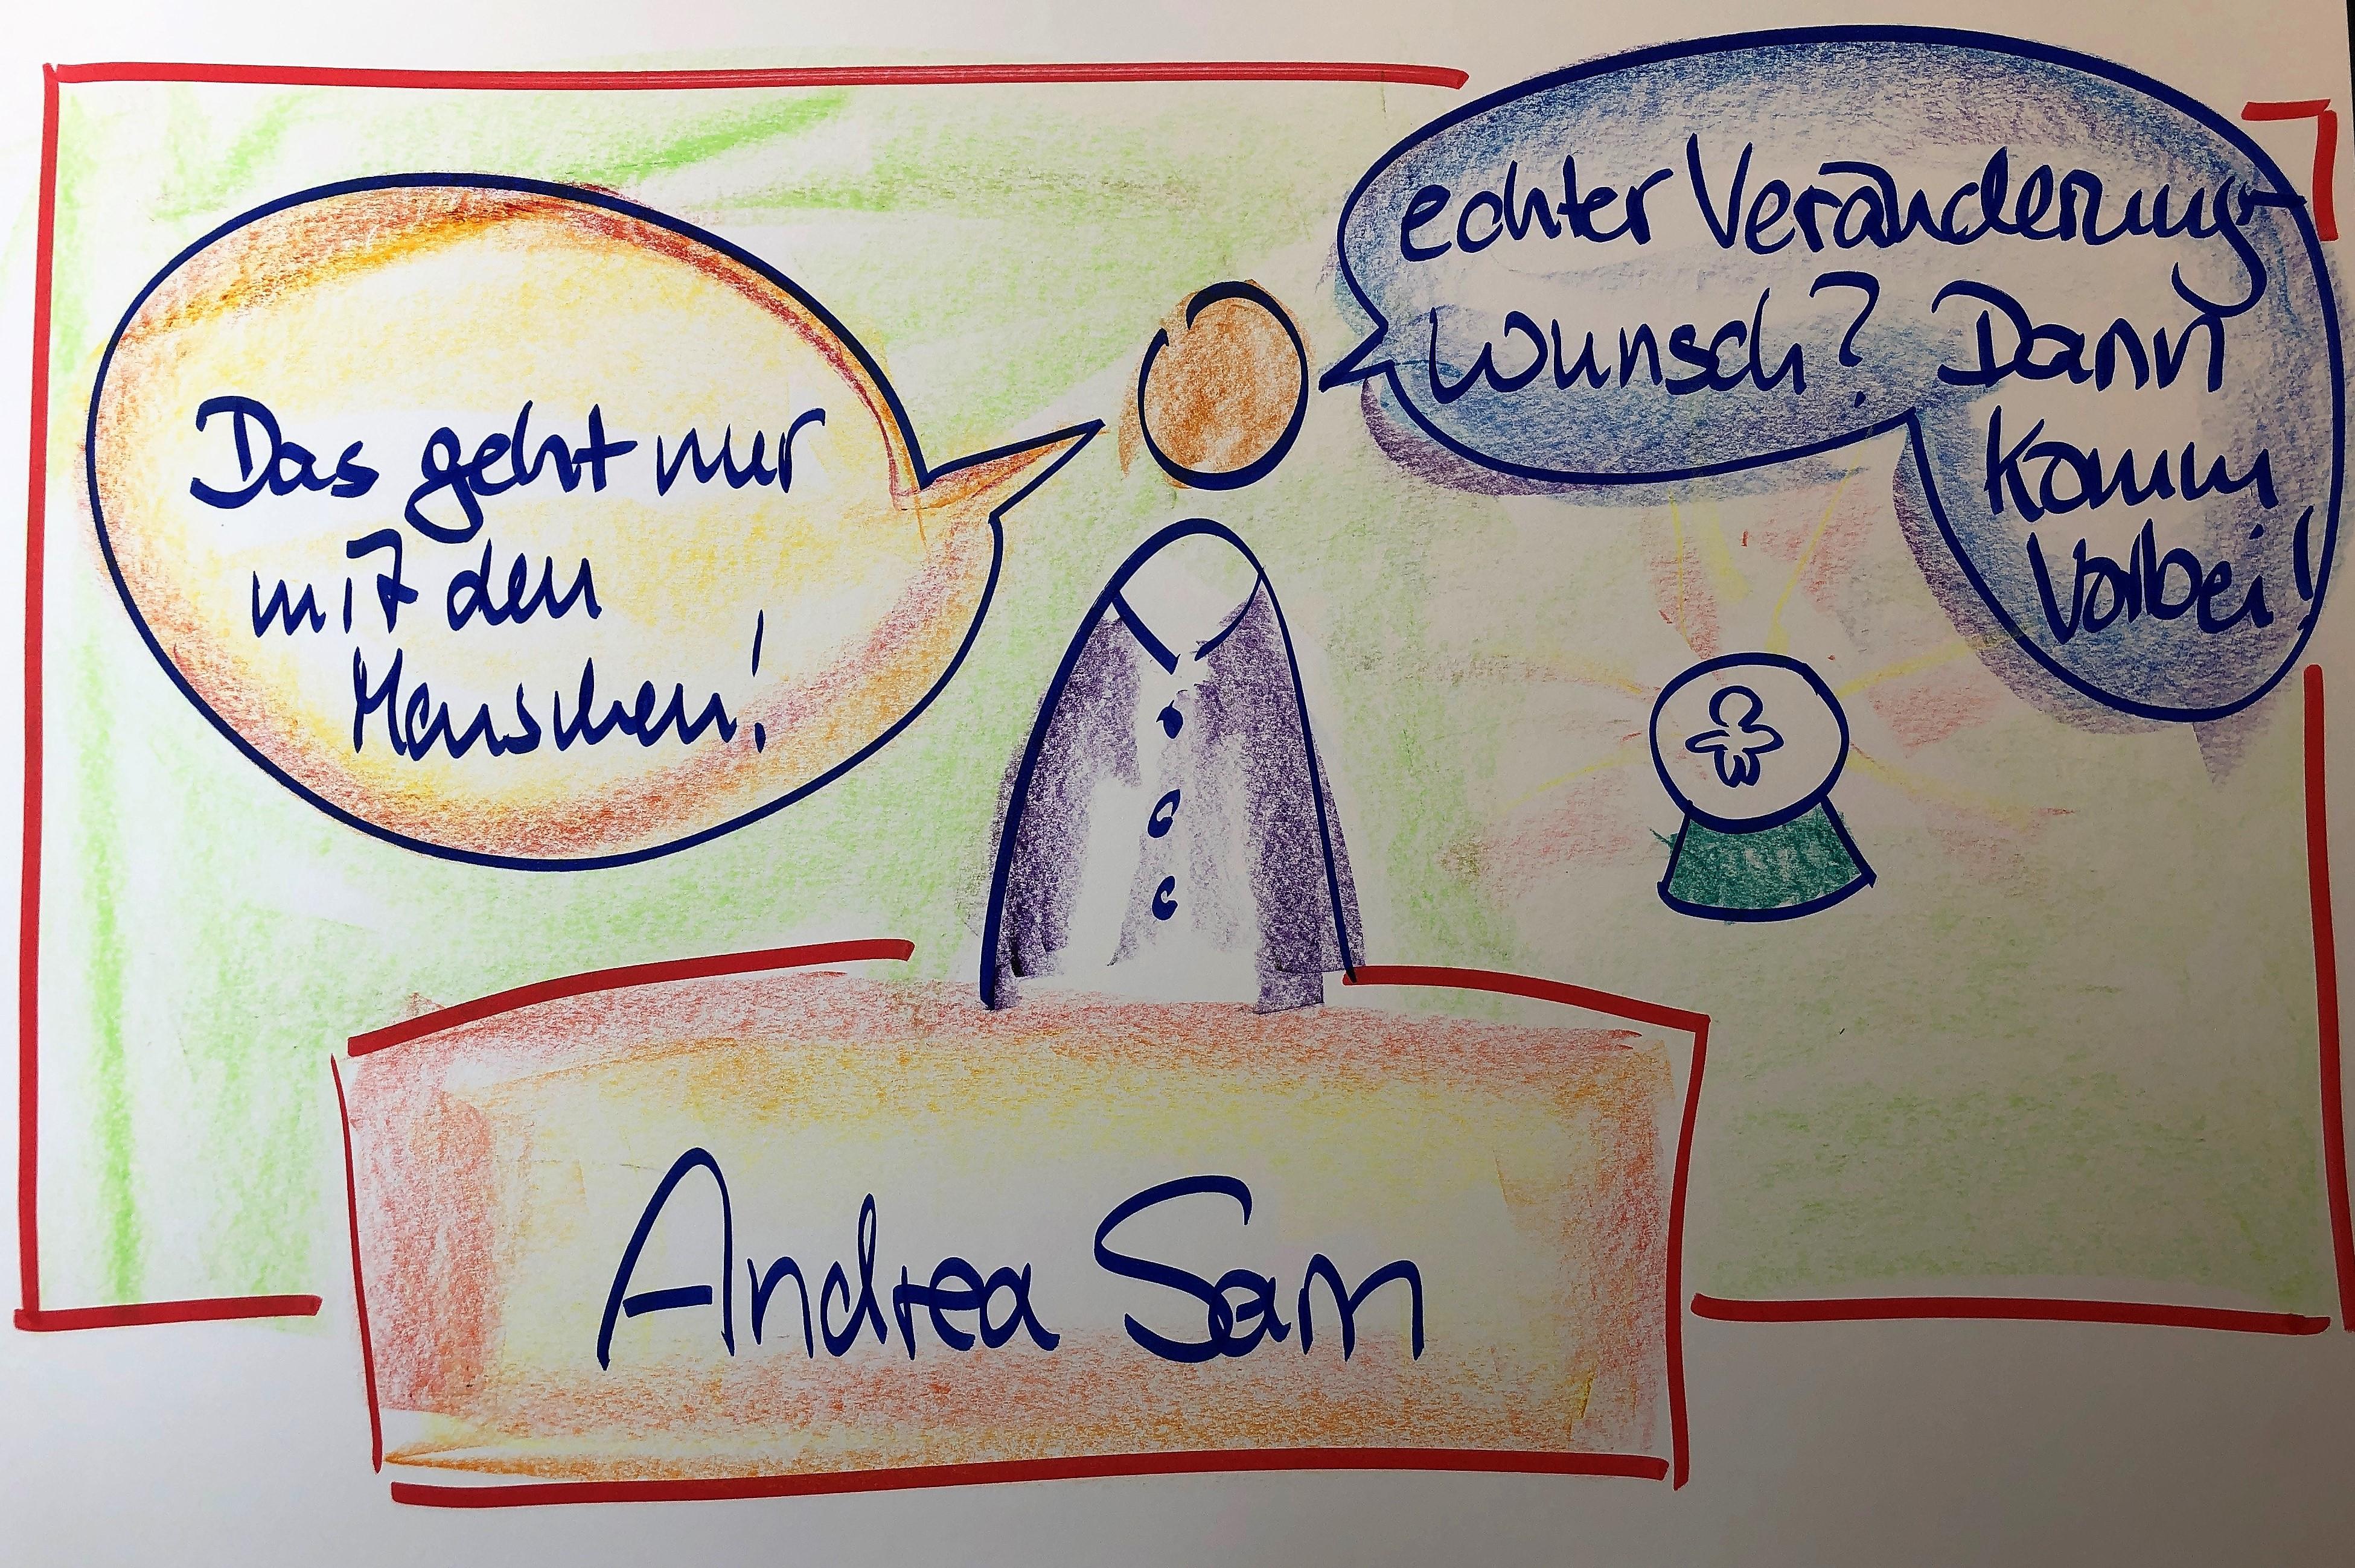 Andrea Sam